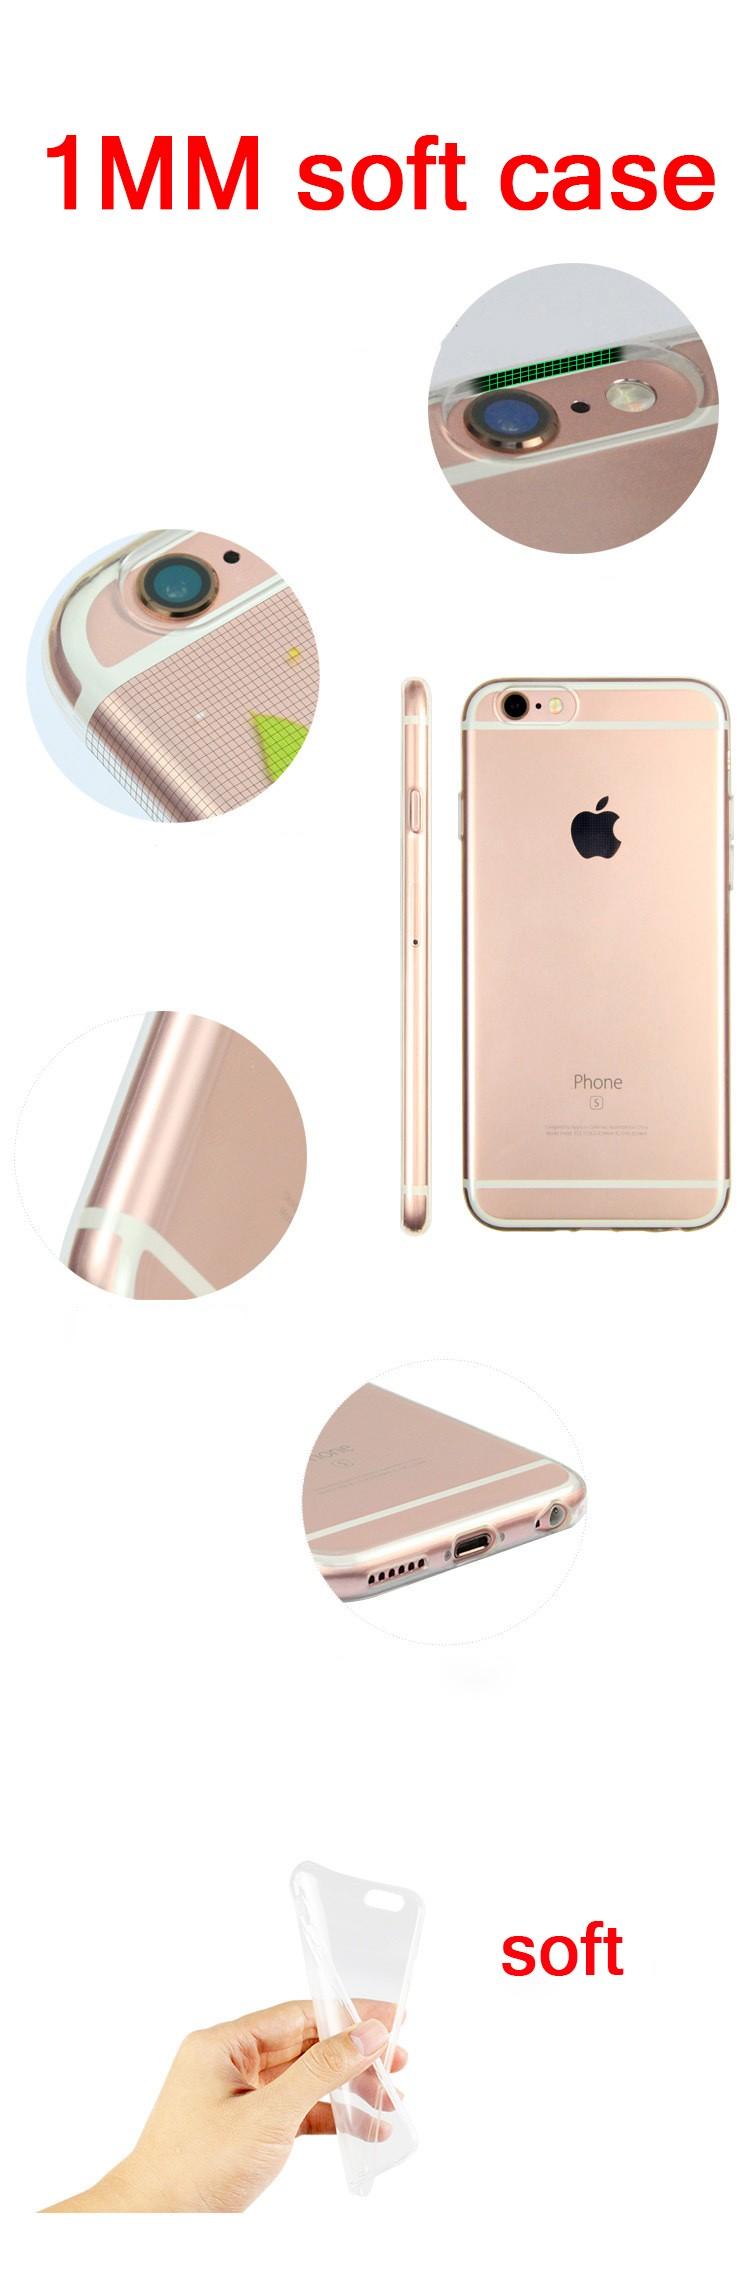 Phone case Fly Emirates PSG paris saint germain silicon clear soft TPU coque for iPhone7 7plus 6 6S 6plus 6Splus 5C 4S 5S SE